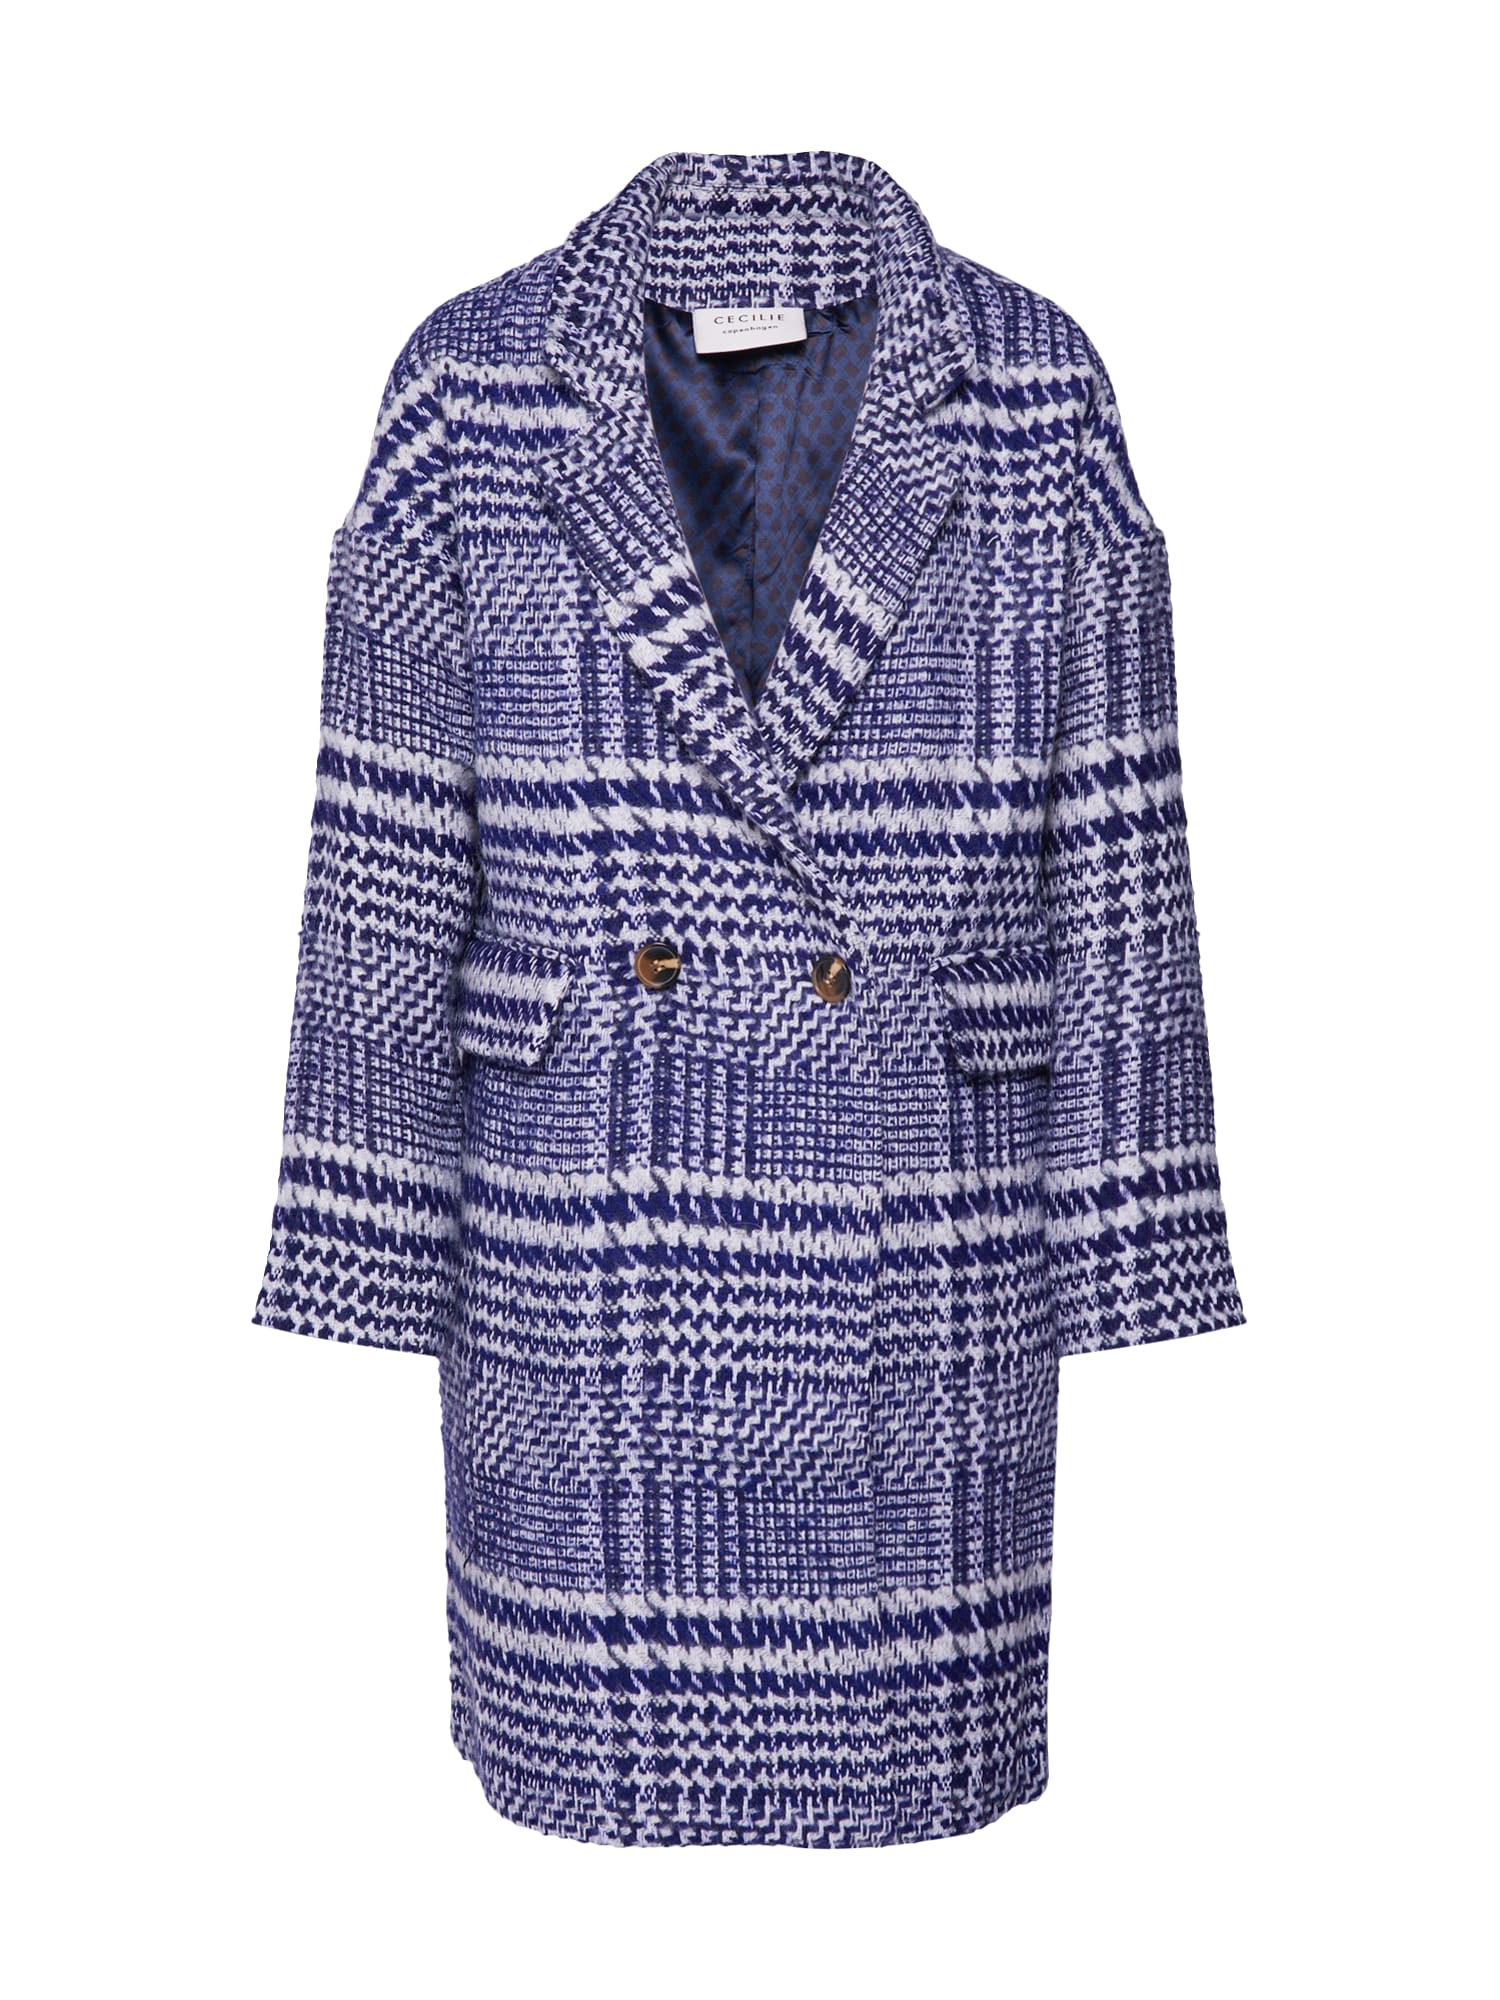 Cecilie Copenhagen Rudeninis-žieminis paltas 'Alvia' mėlyna